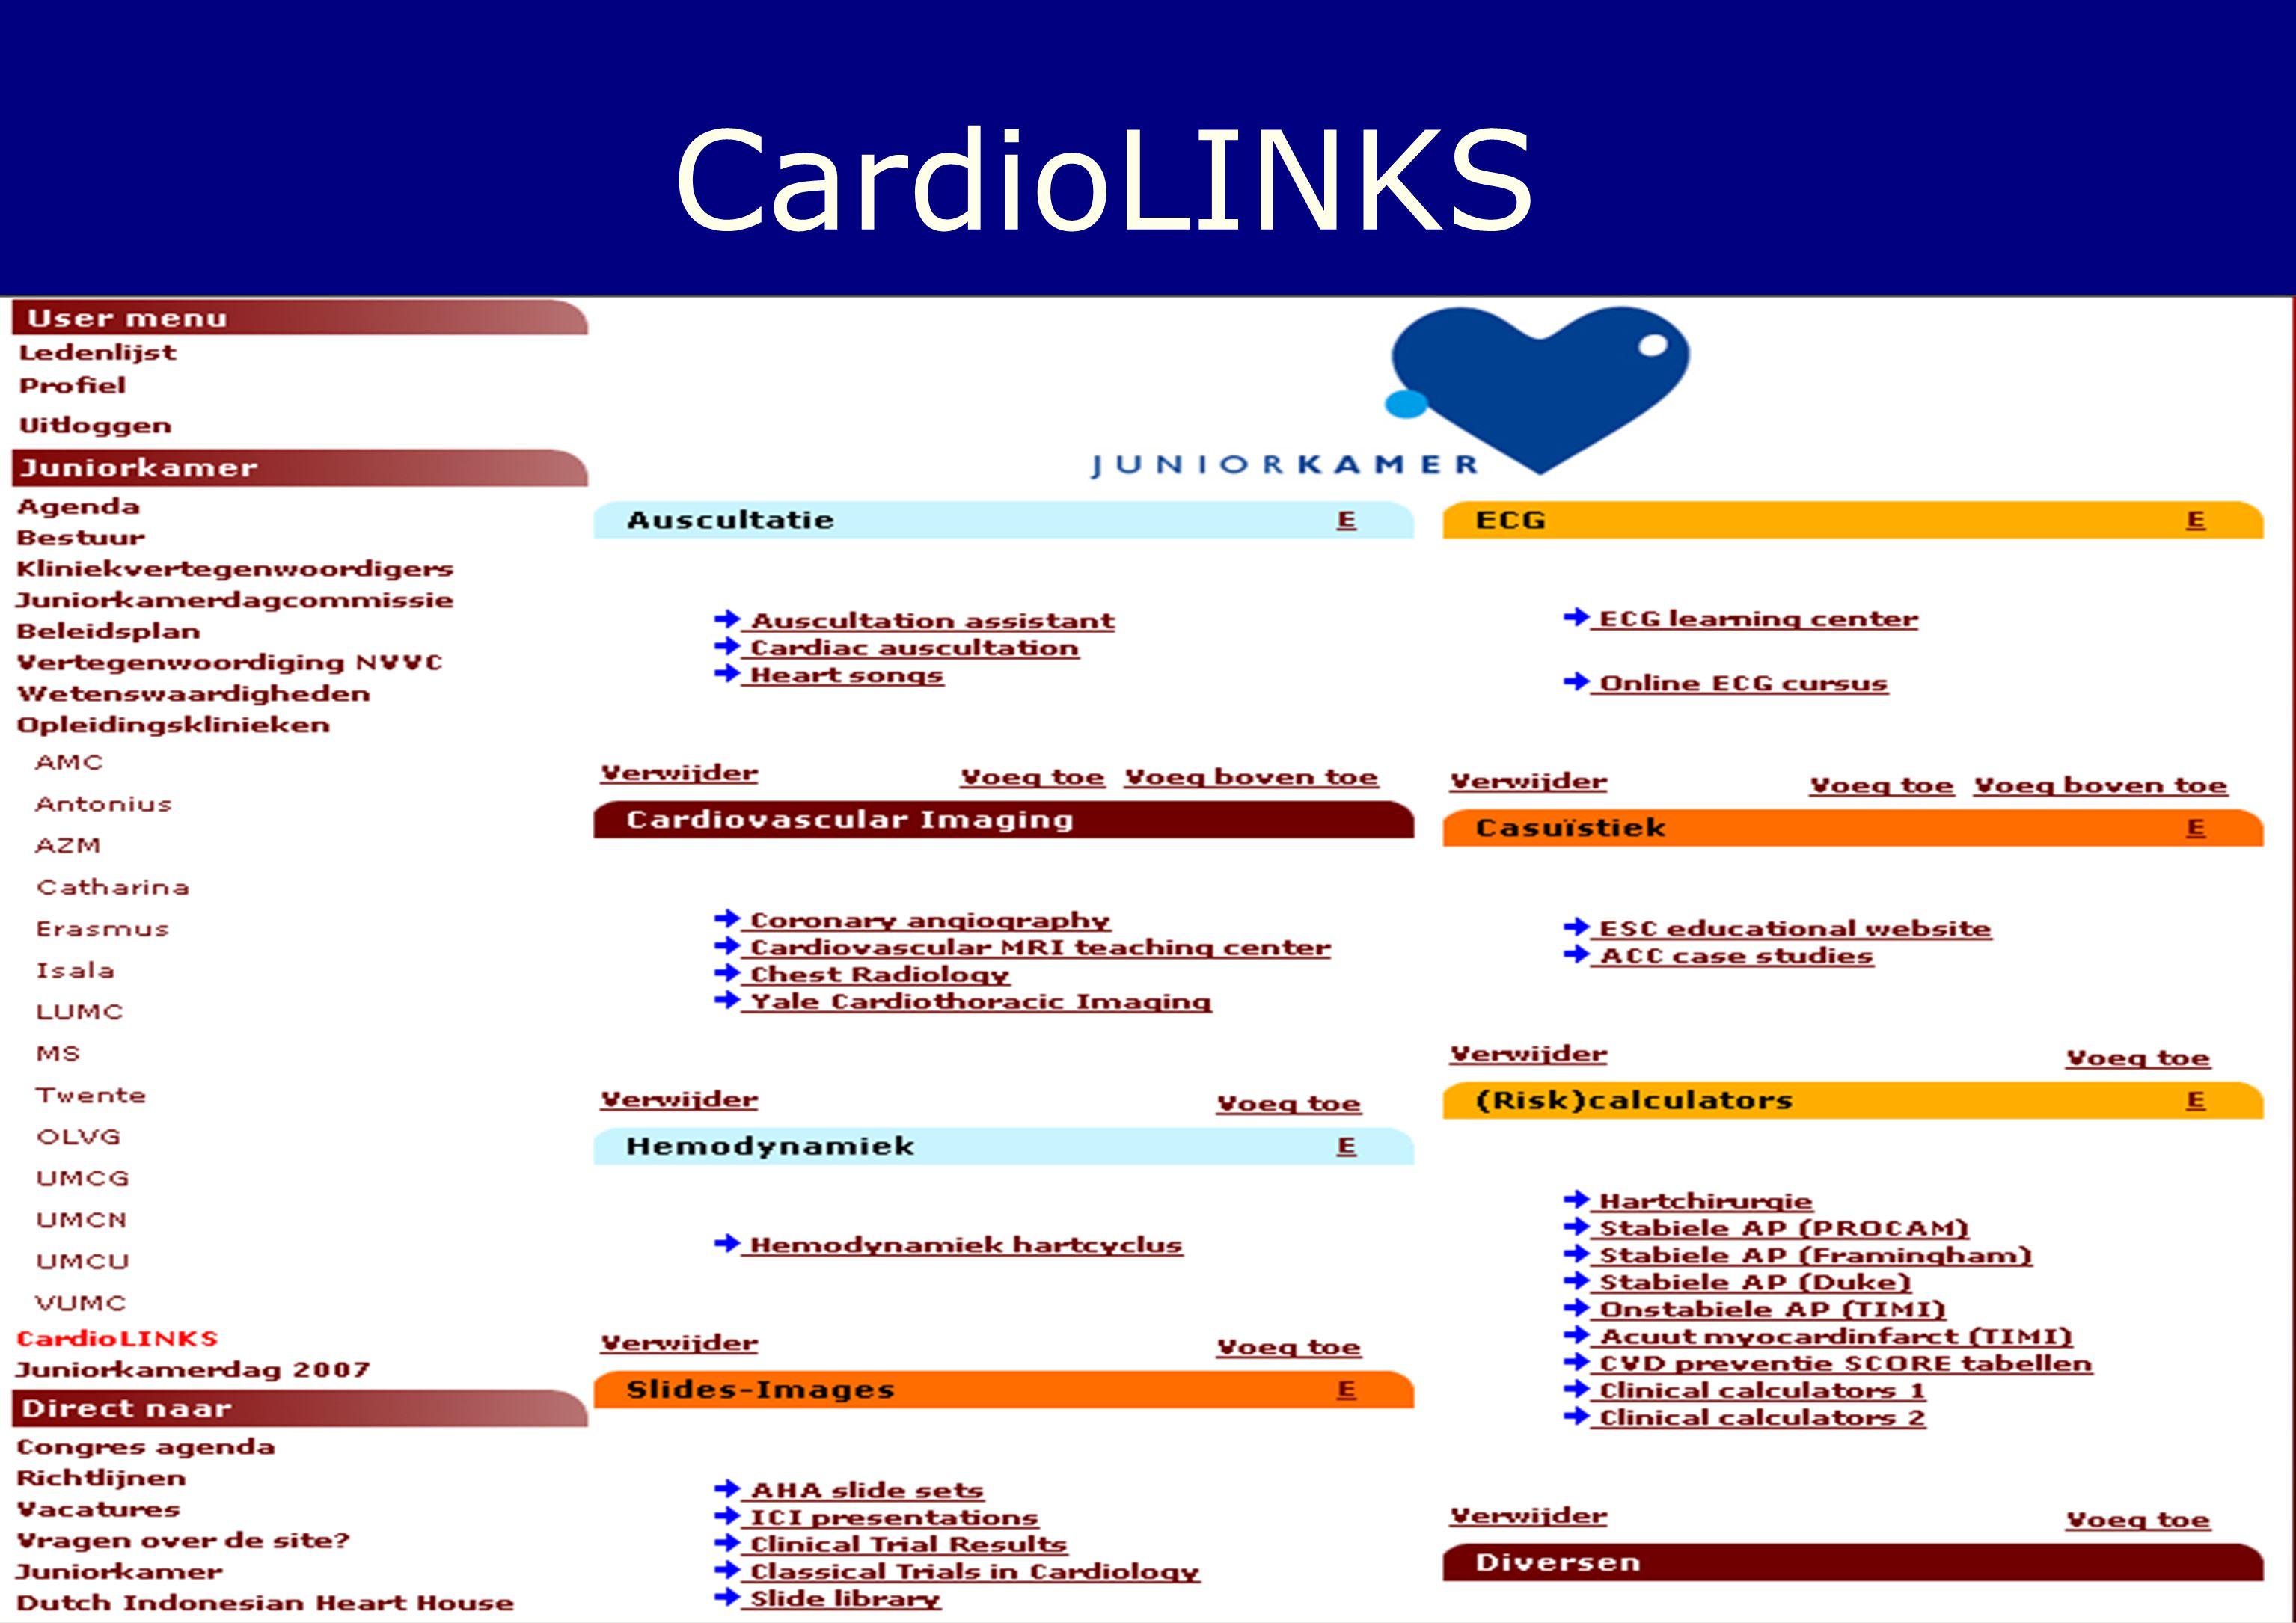 CardioLINKS